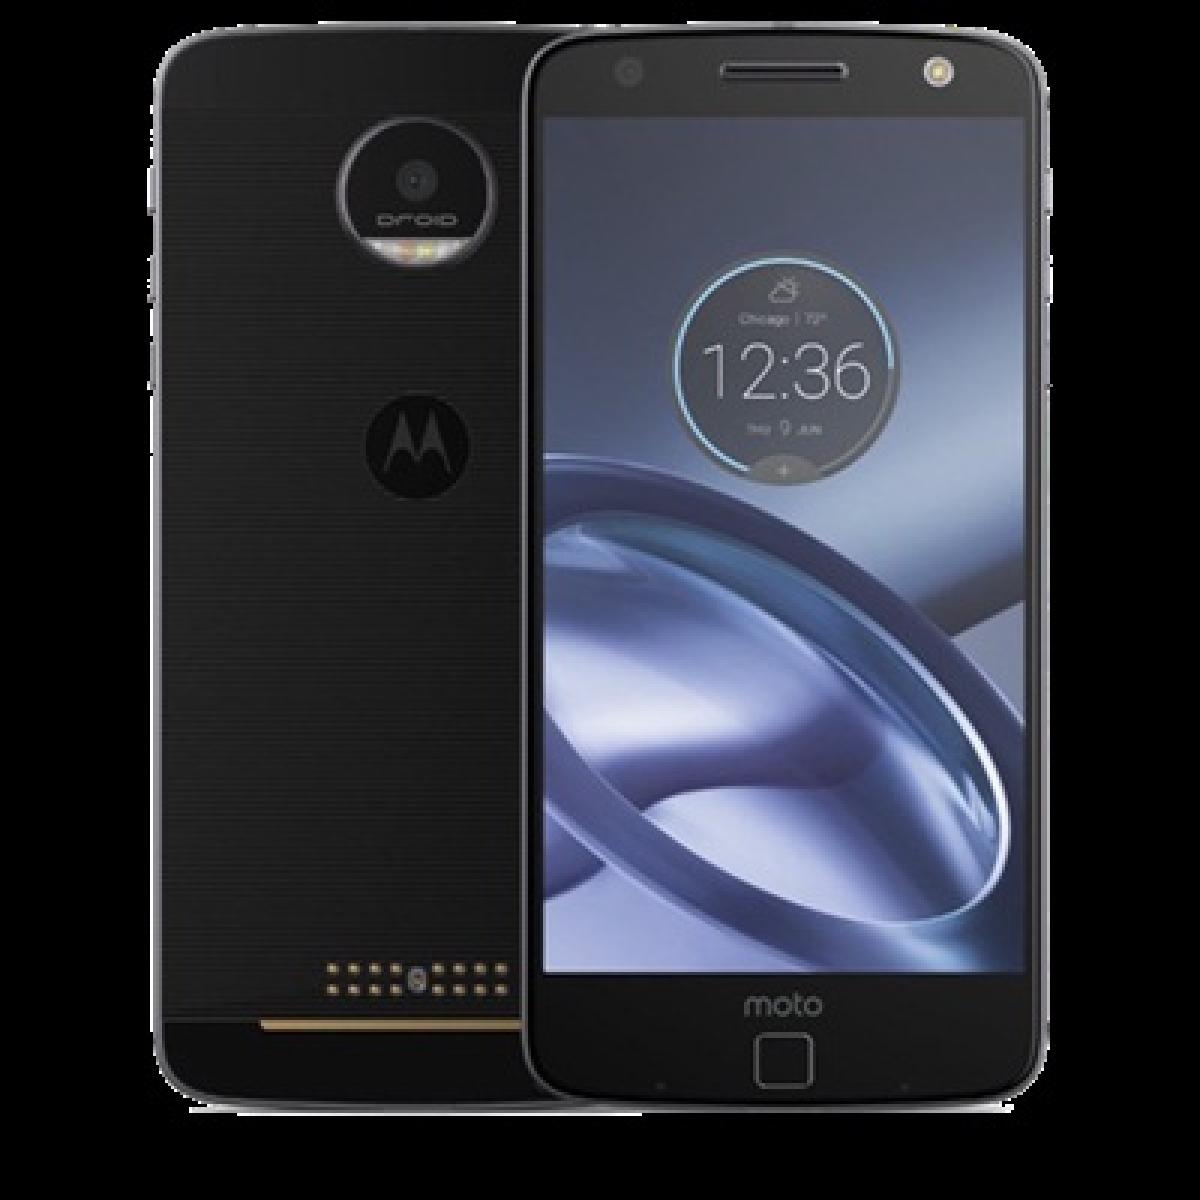 Motorola ZDroid – When Tech has got your back!